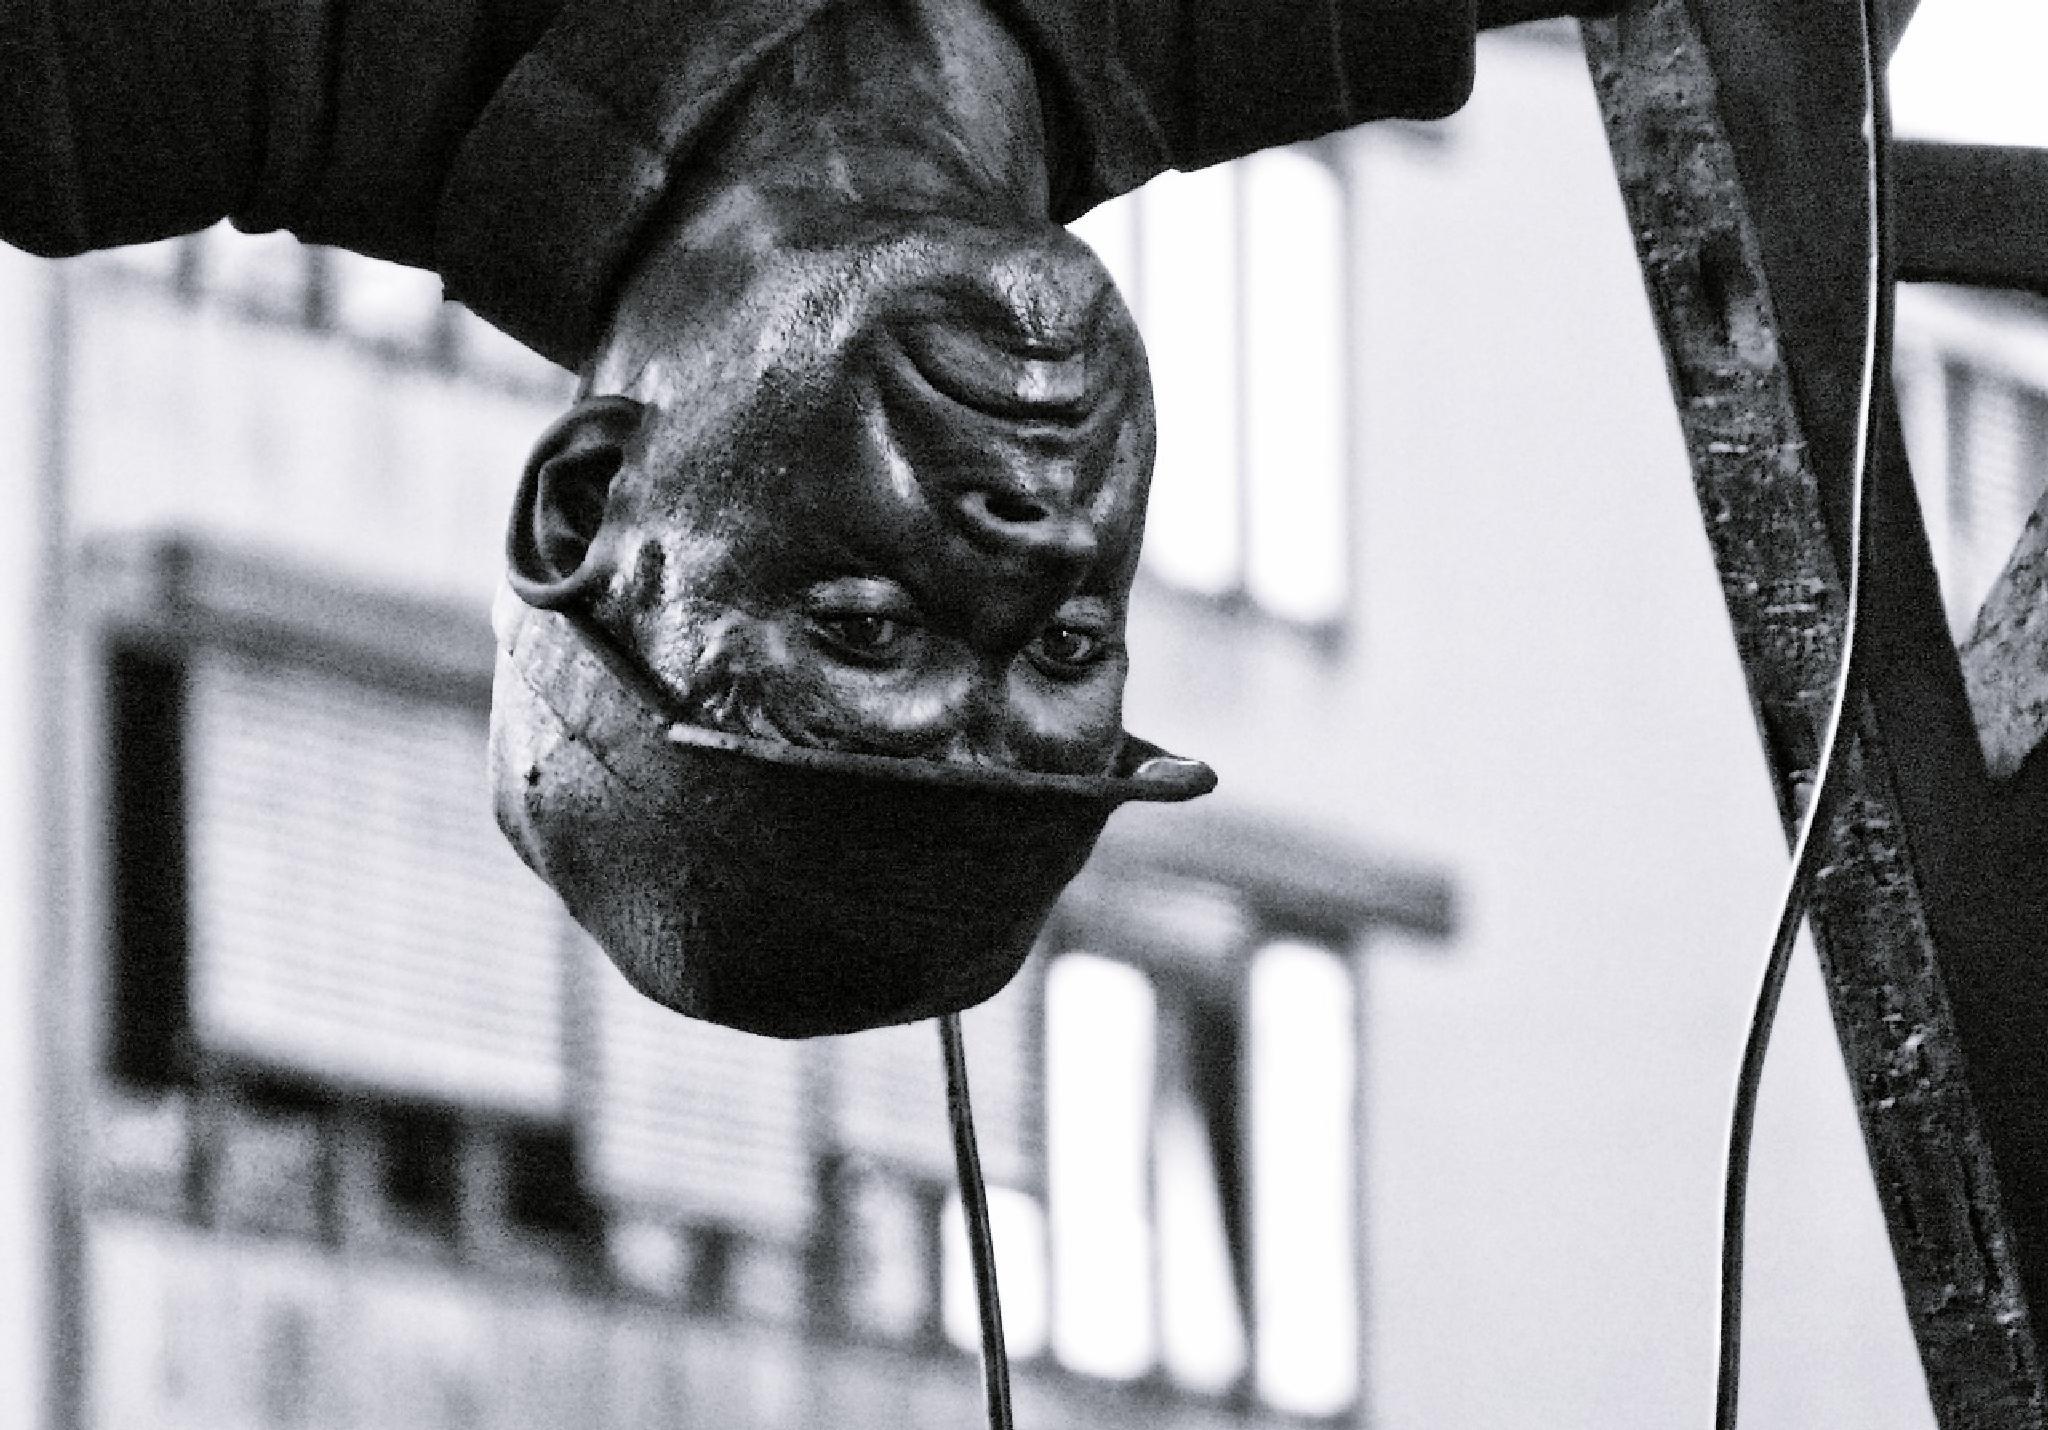 iron man down by WolfgangH